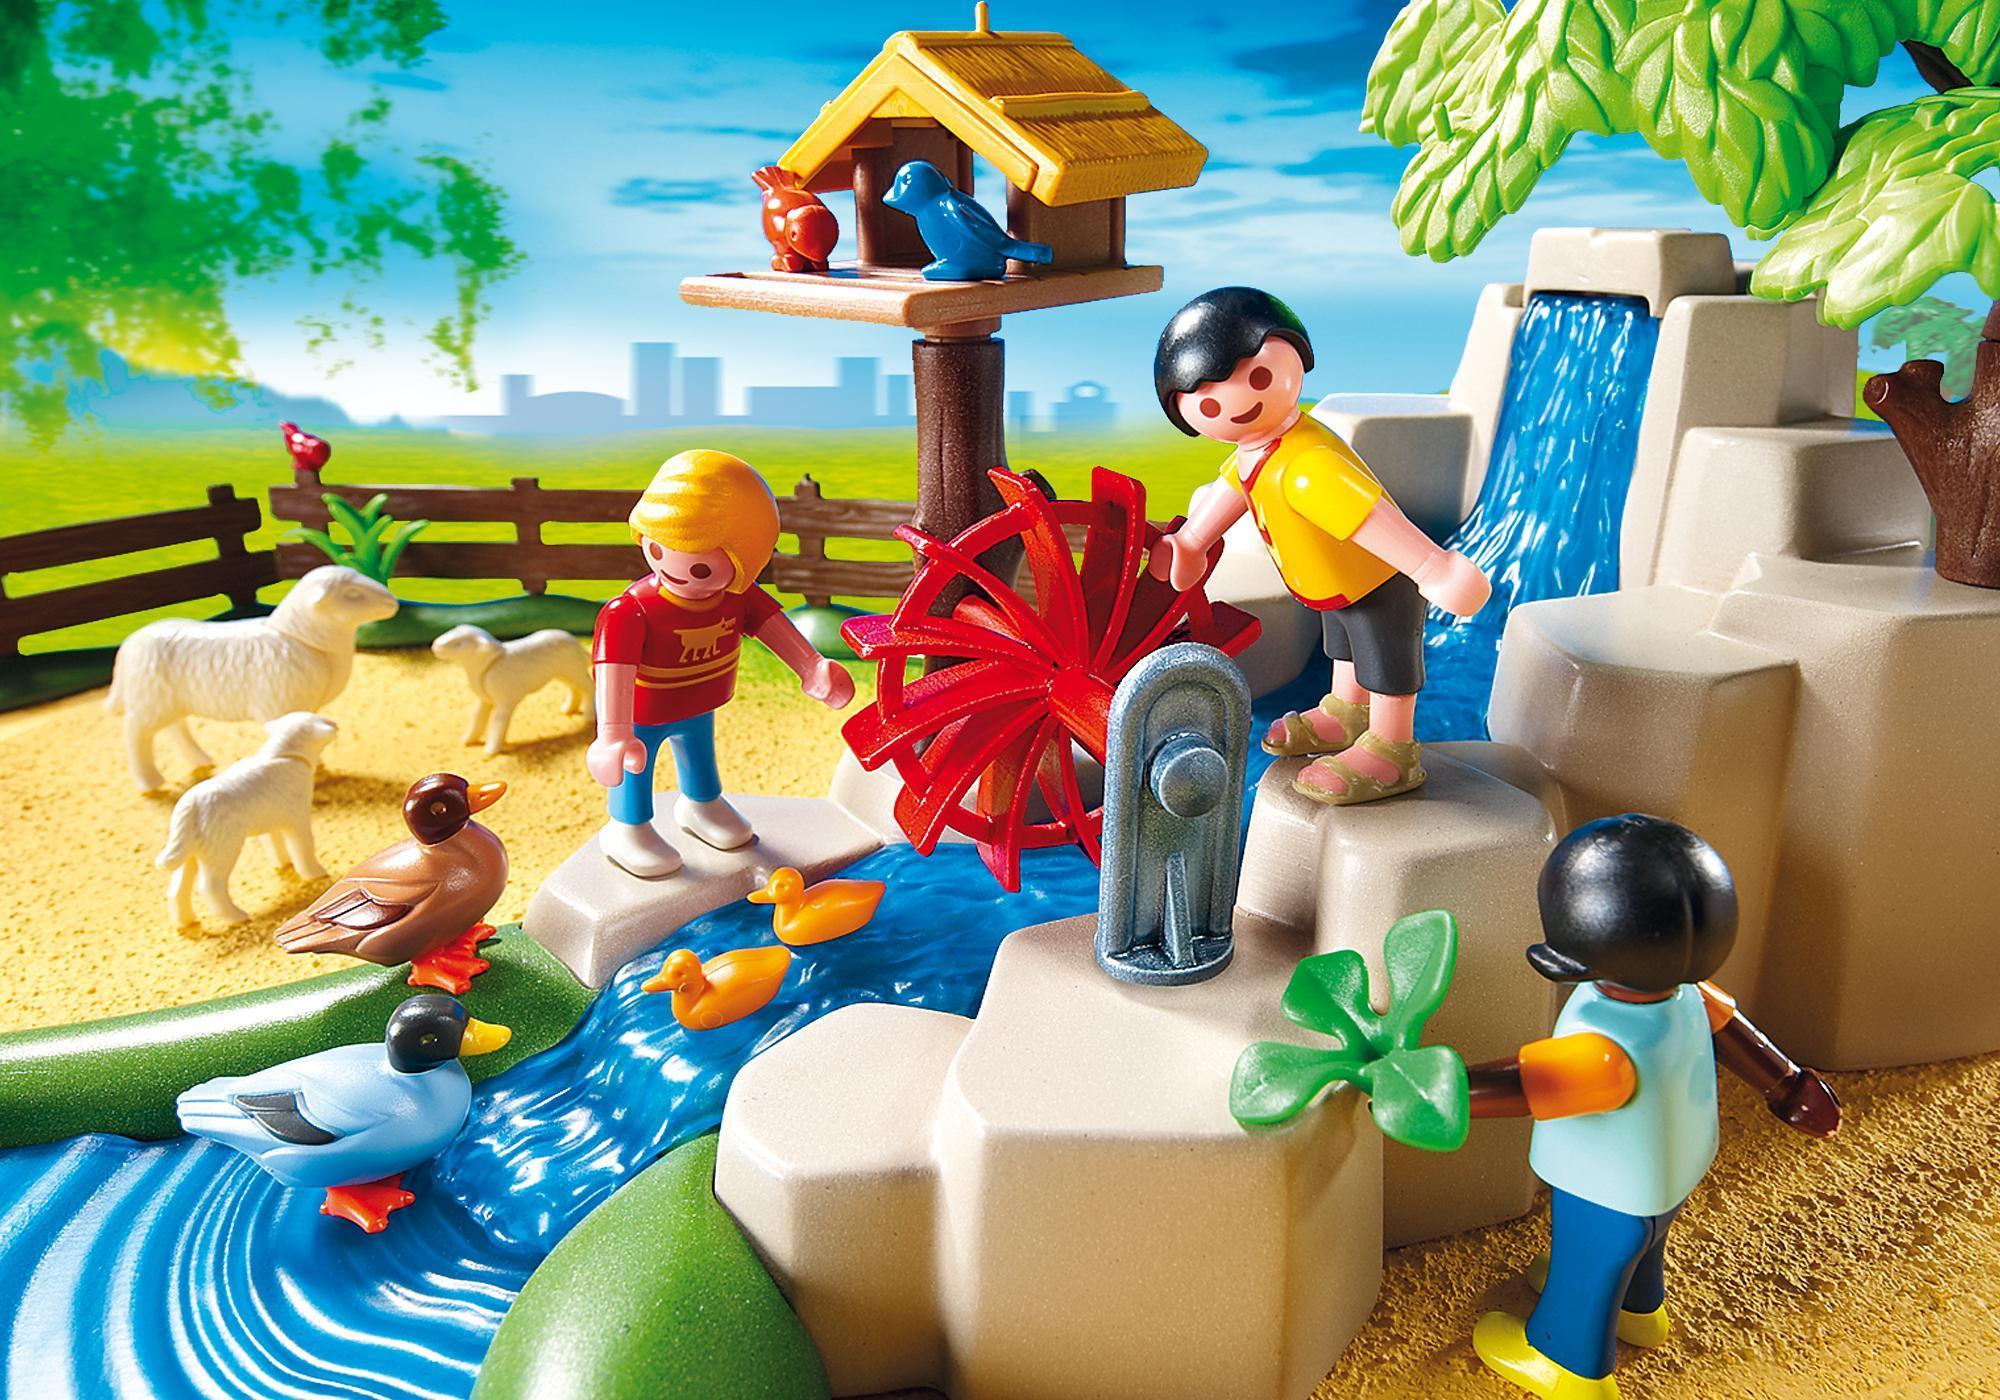 http://media.playmobil.com/i/playmobil/4851_product_extra2/Streichelzoo